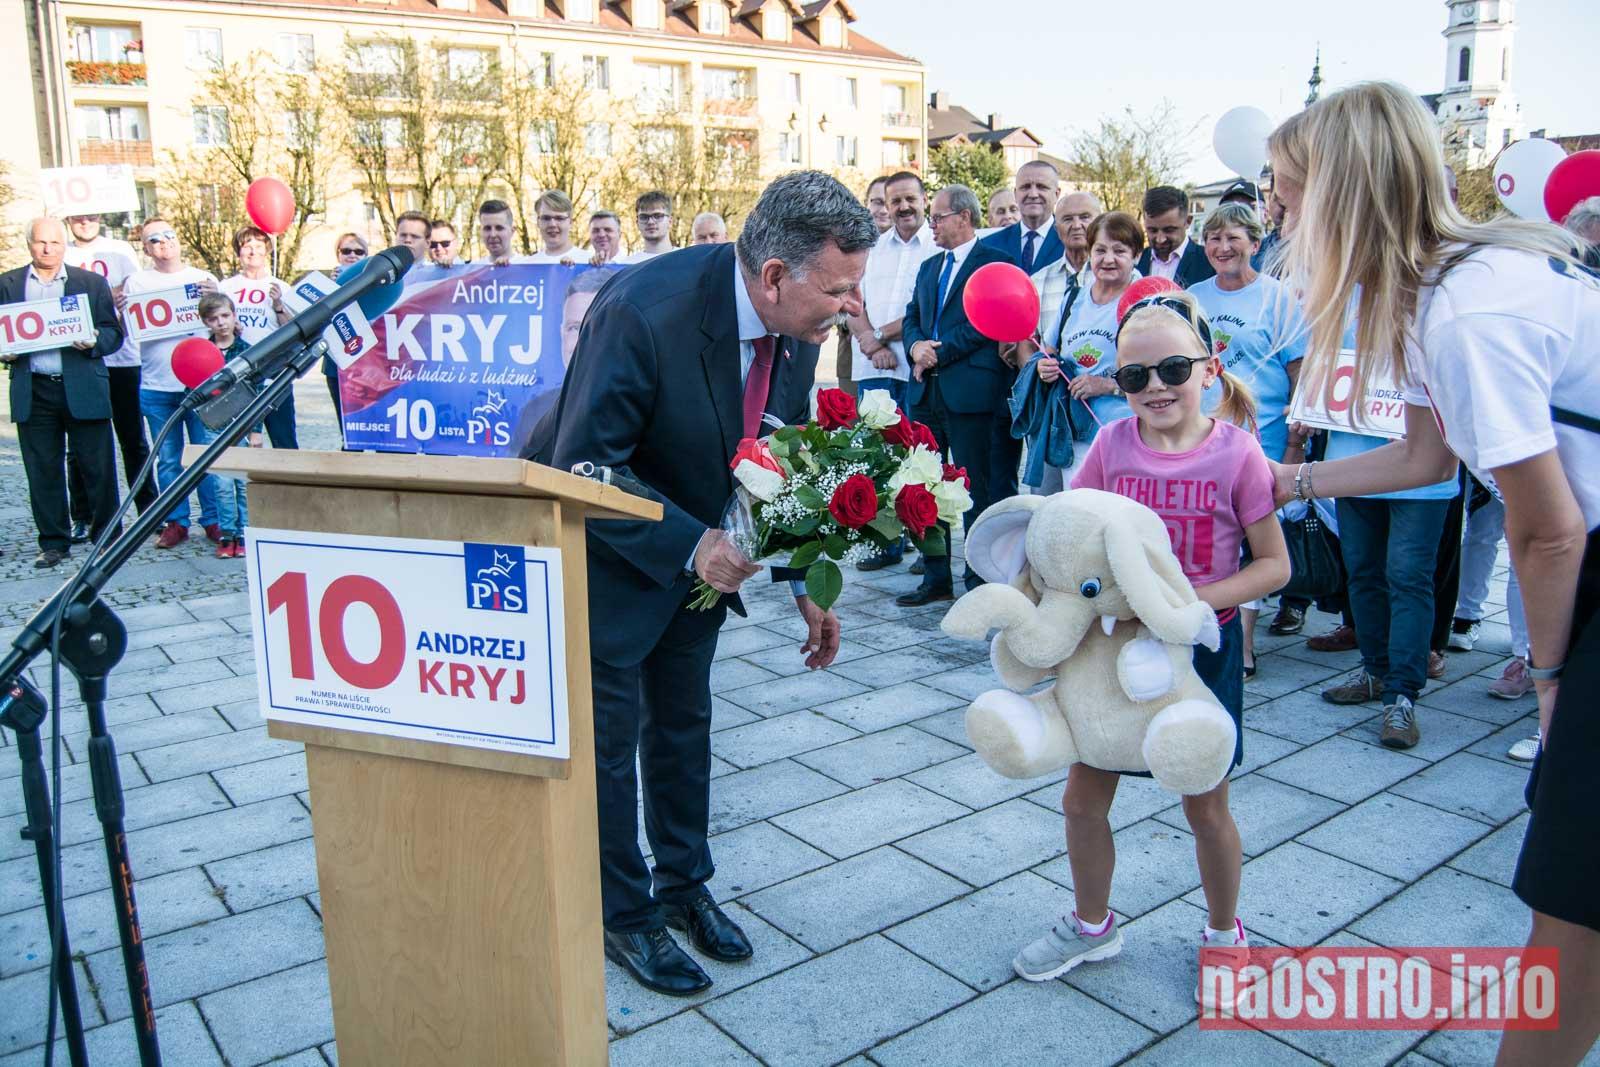 NaOSTRO Andrzej Kryj kampania-23